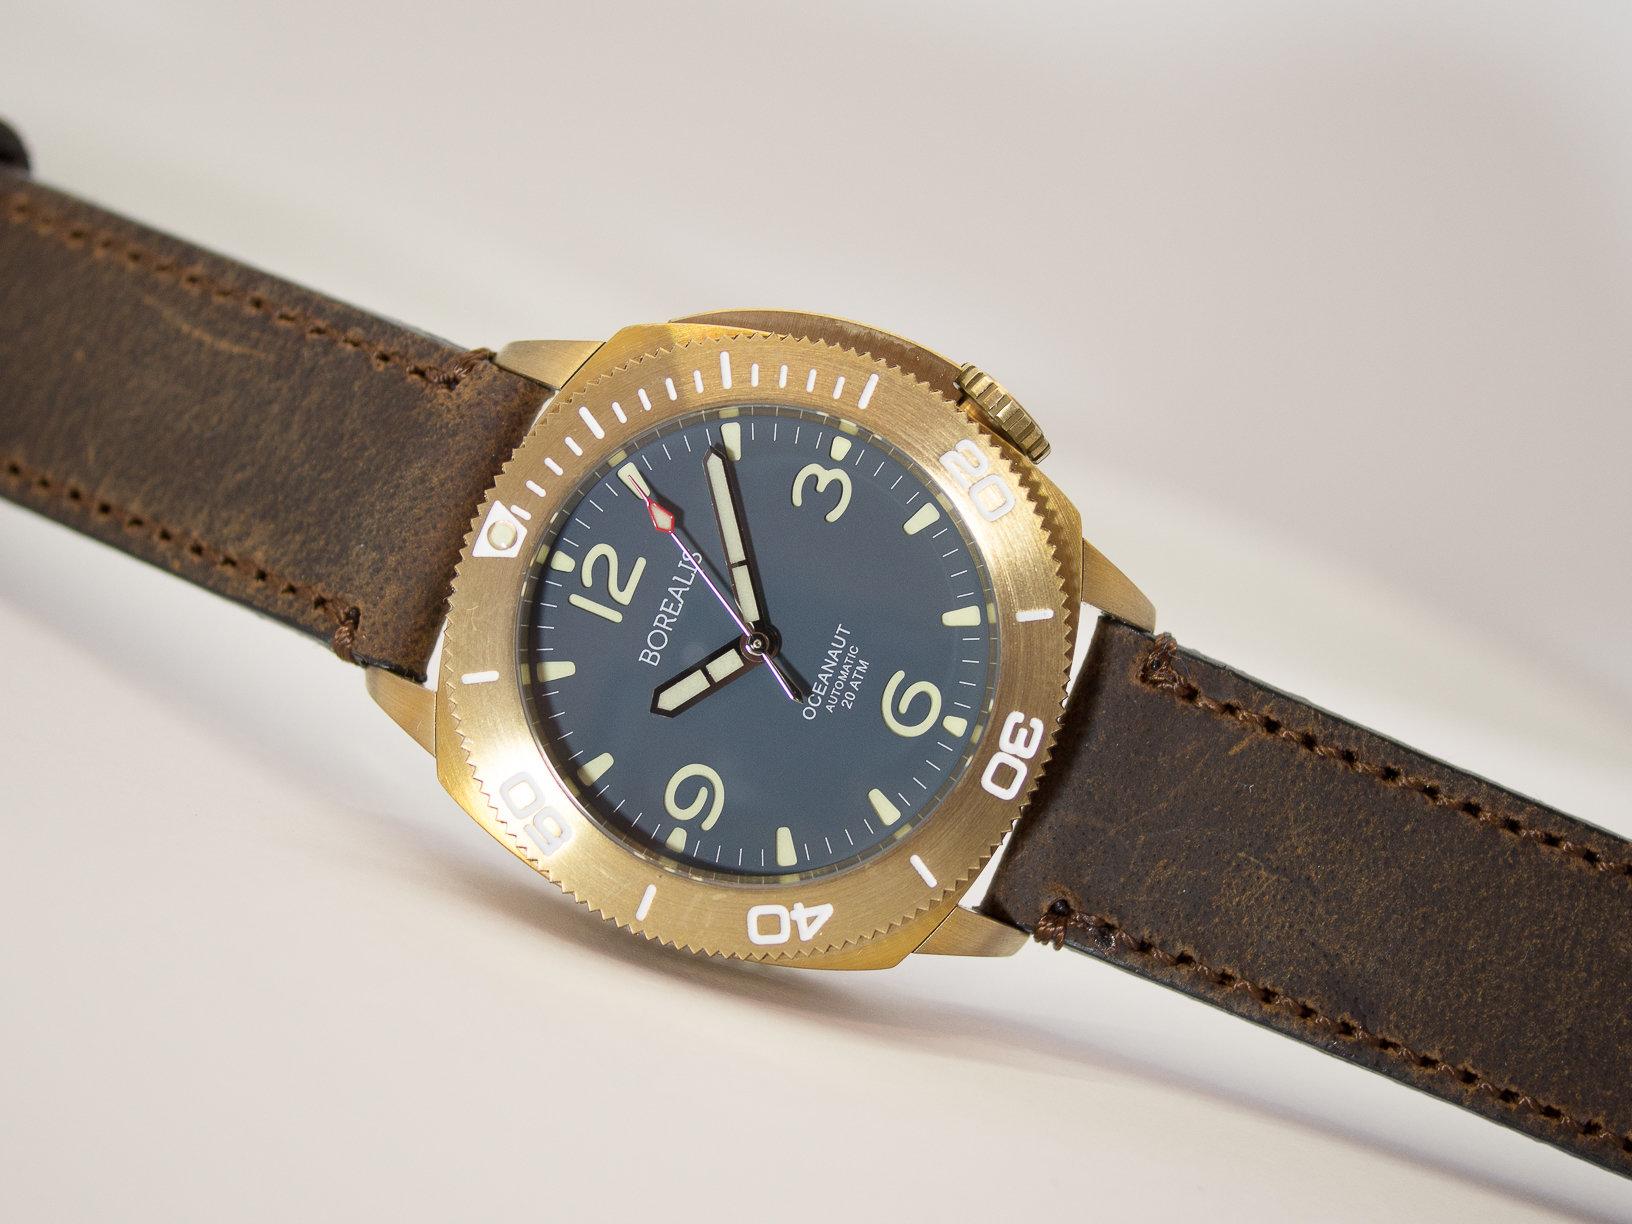 Borealis Oceanaut Aluminum Bronze Teal Blue No Date 200m NH35 Automatic Diver Watch BOCEANAUTBLUENODT